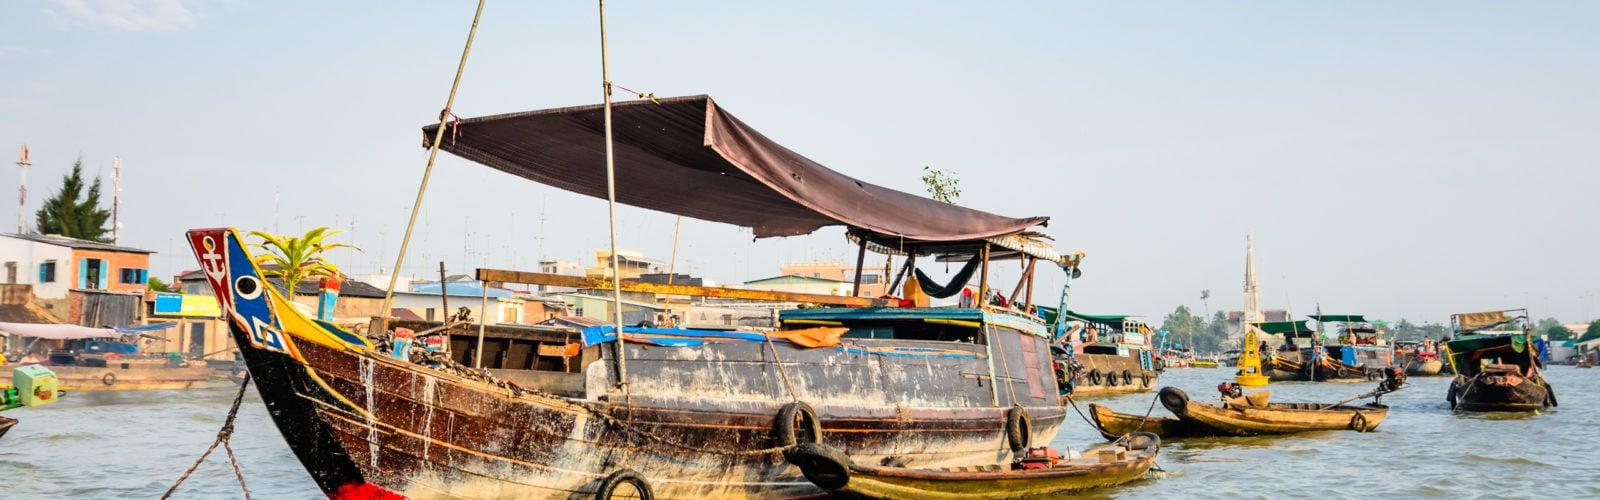 cai-be-floating-market.